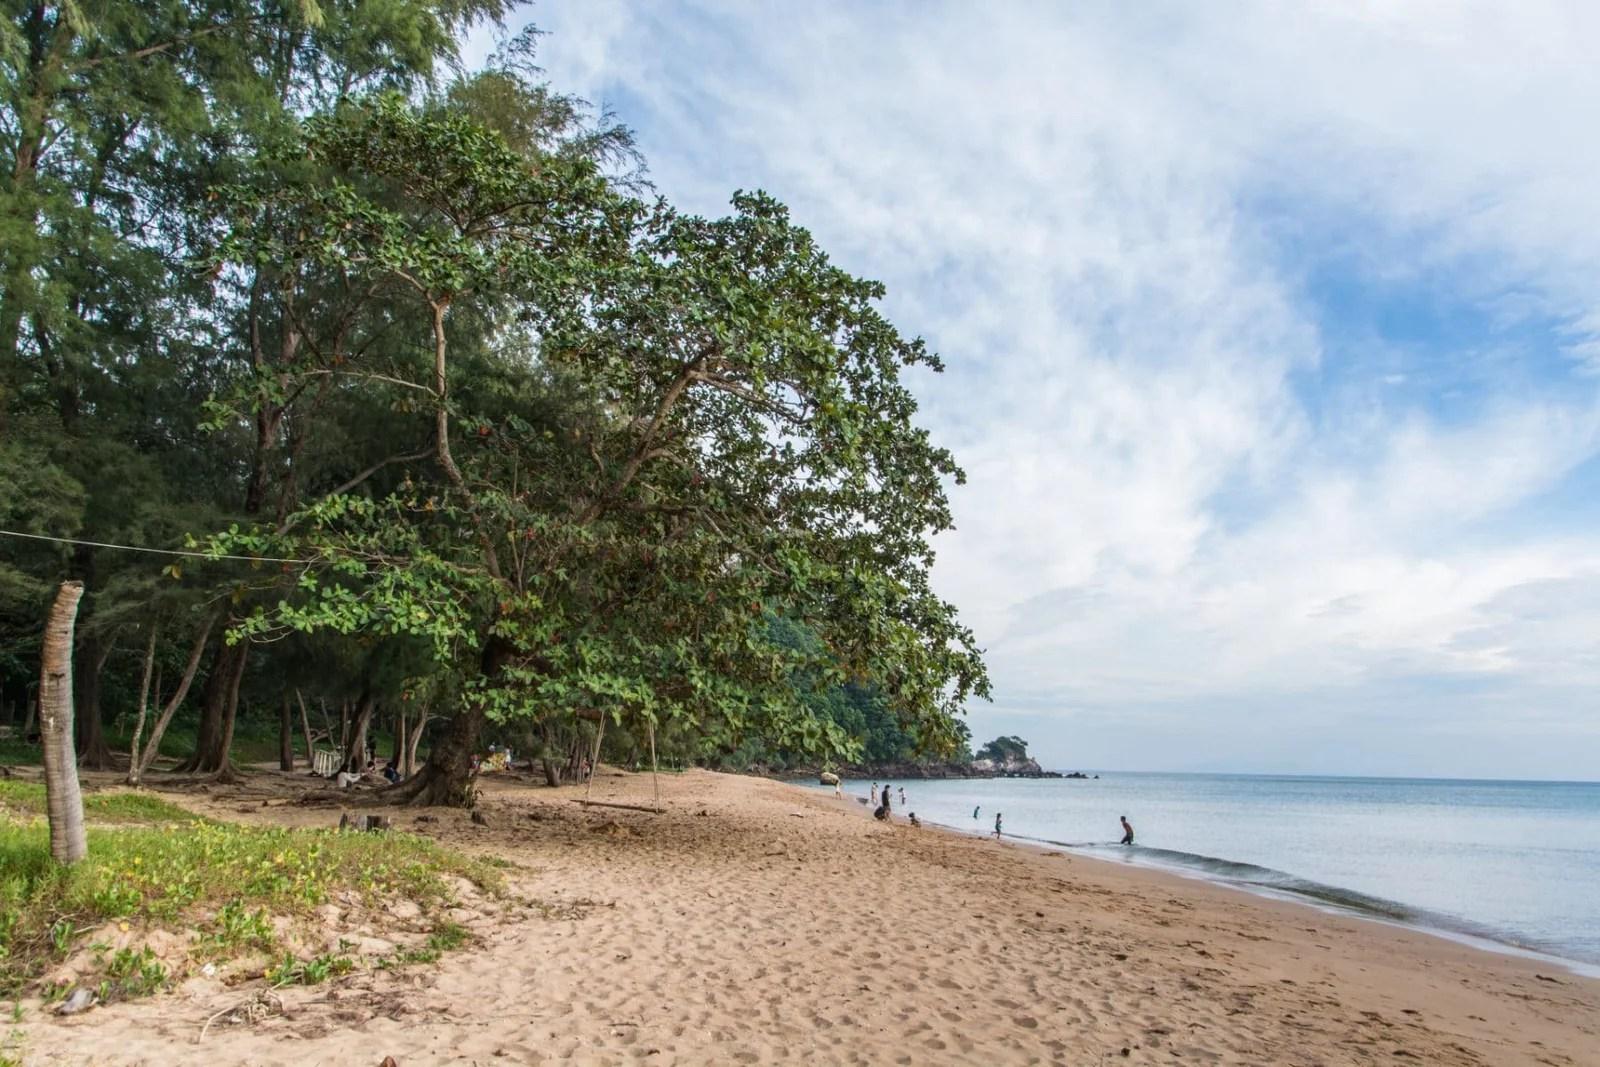 ao krathing - plage chanthaburi - thailande